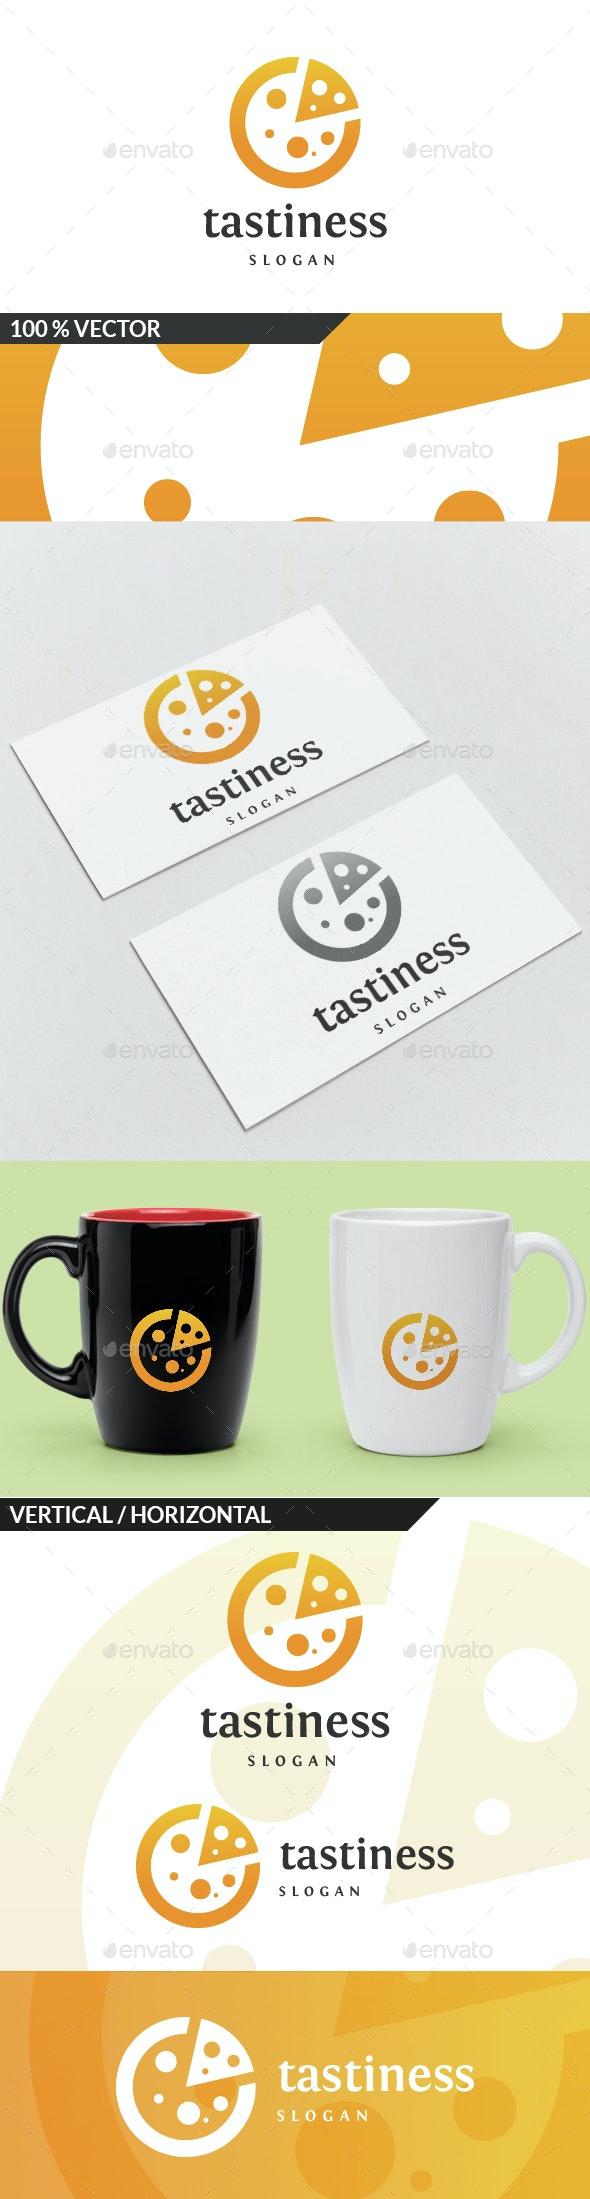 Tastiness Logo - Food Logo Templates